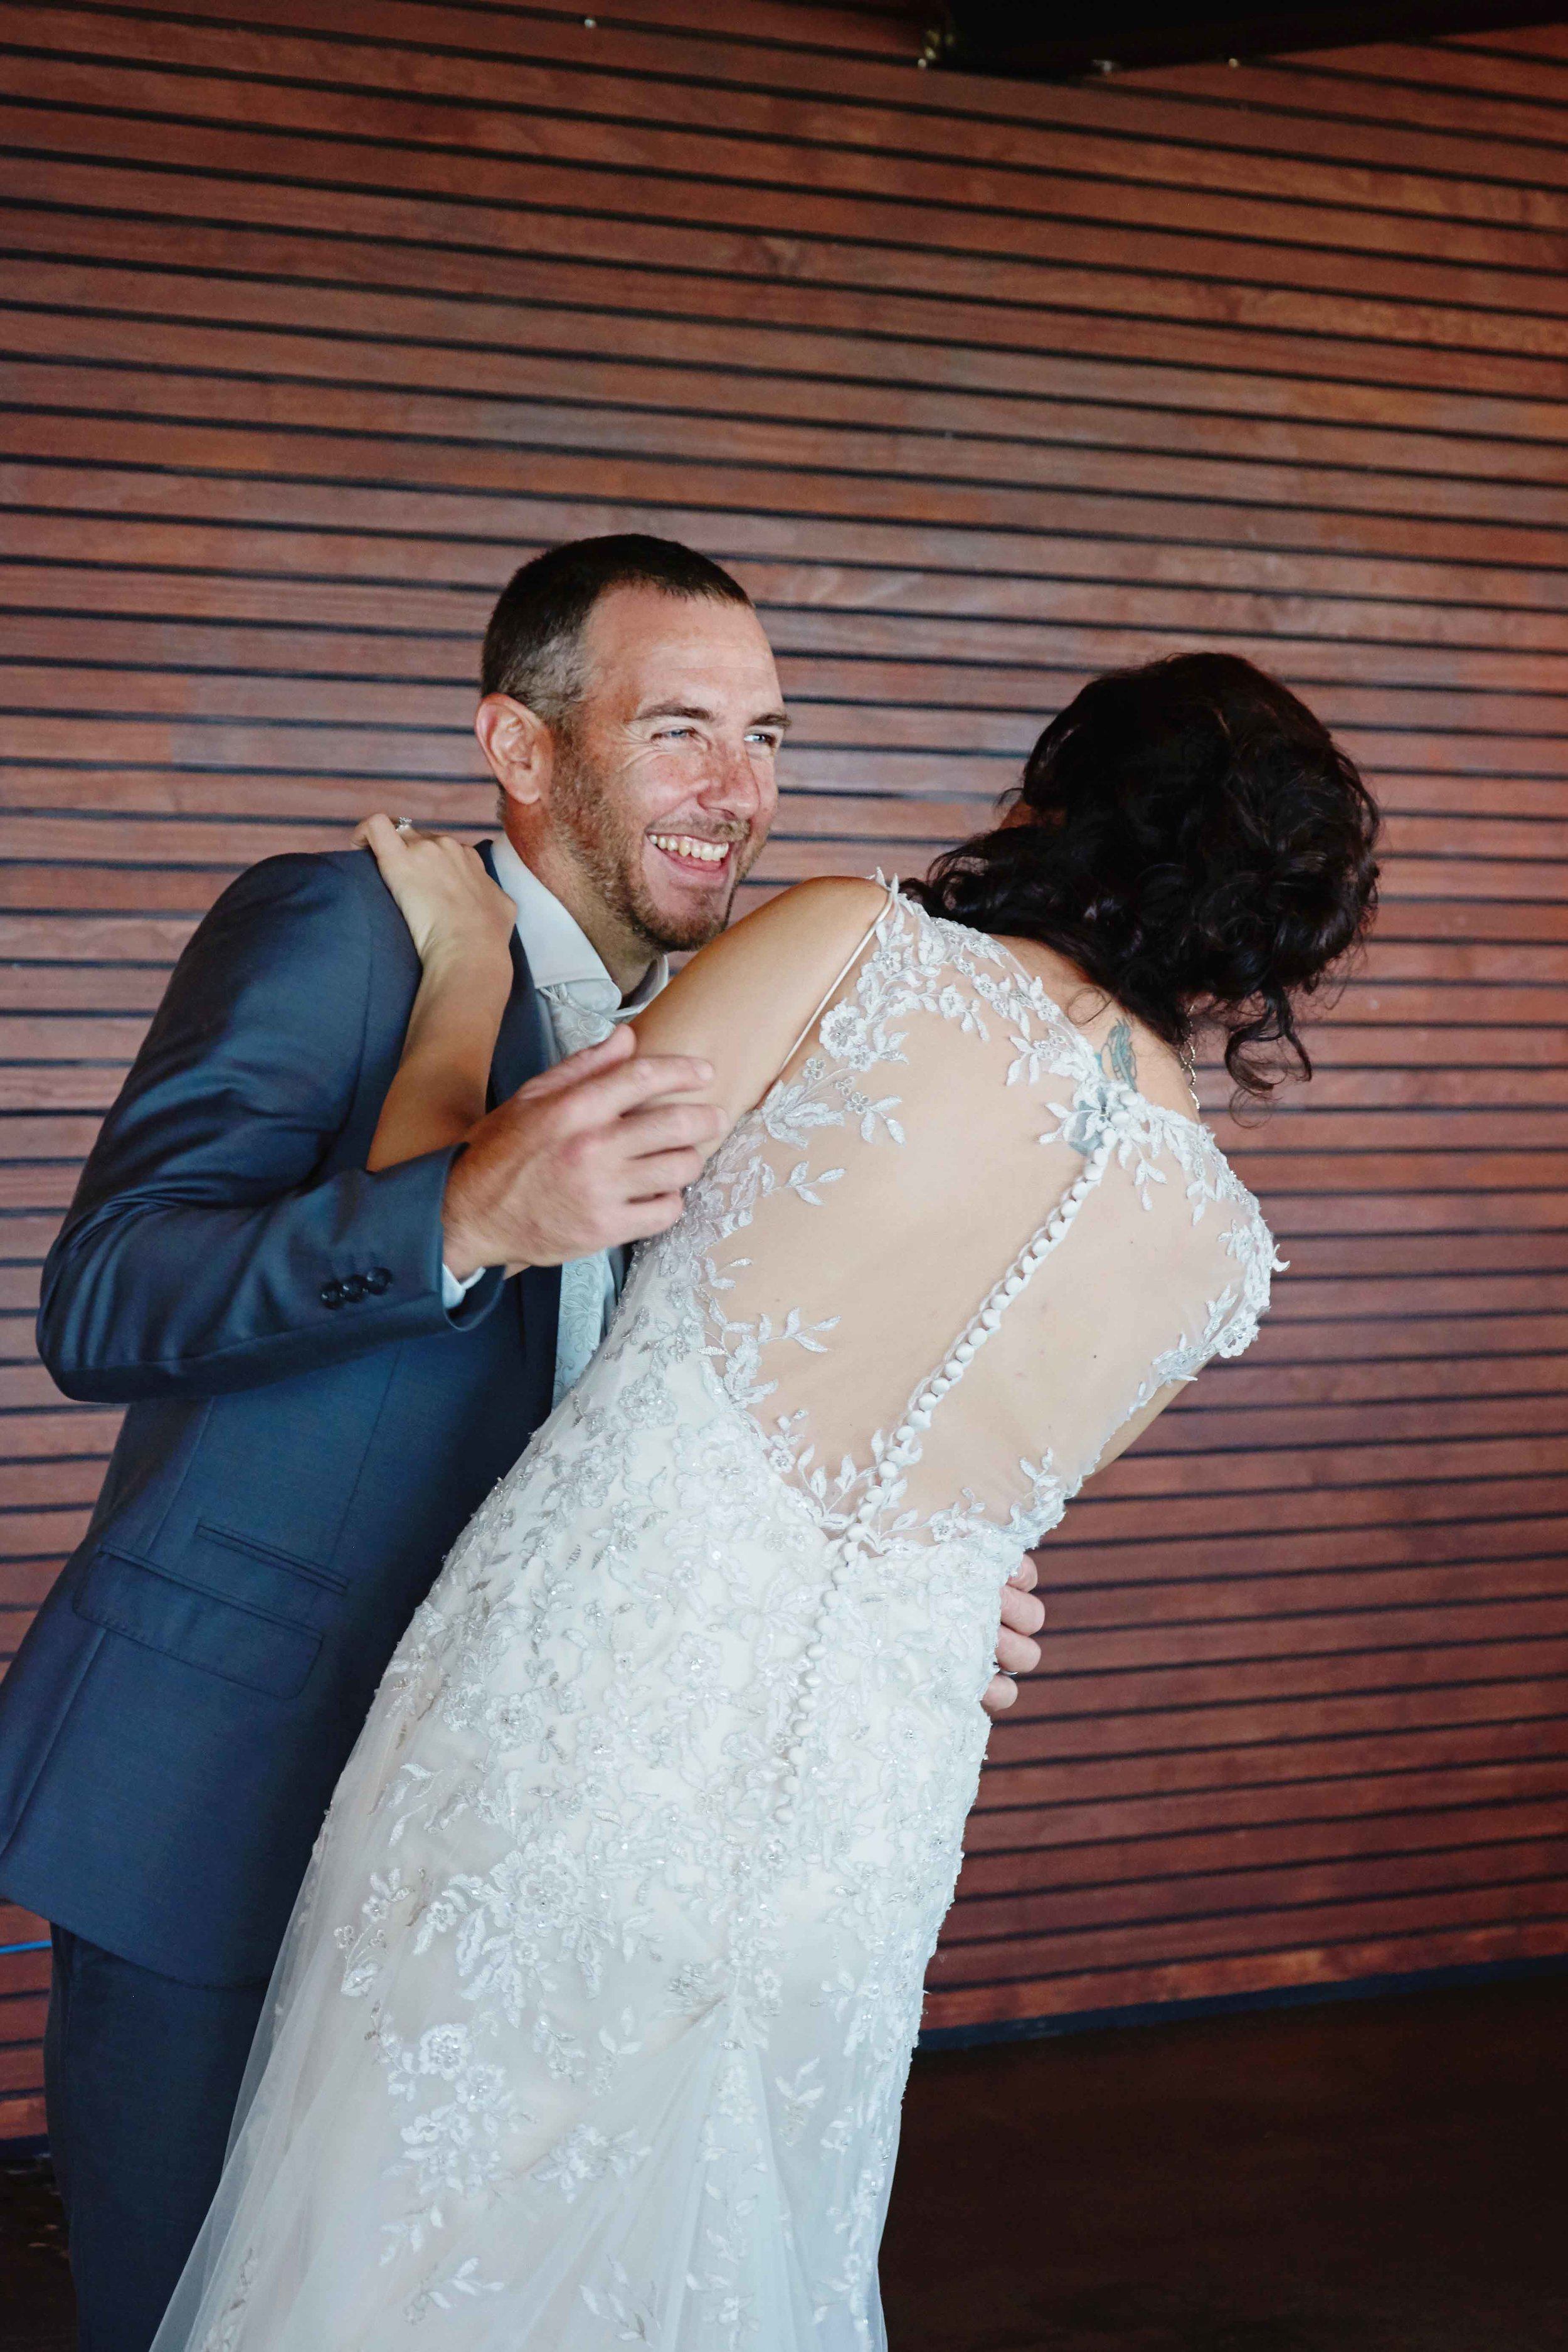 sorrento-wedding-photography-all-smiles-marissa-jade-photography-109.jpg